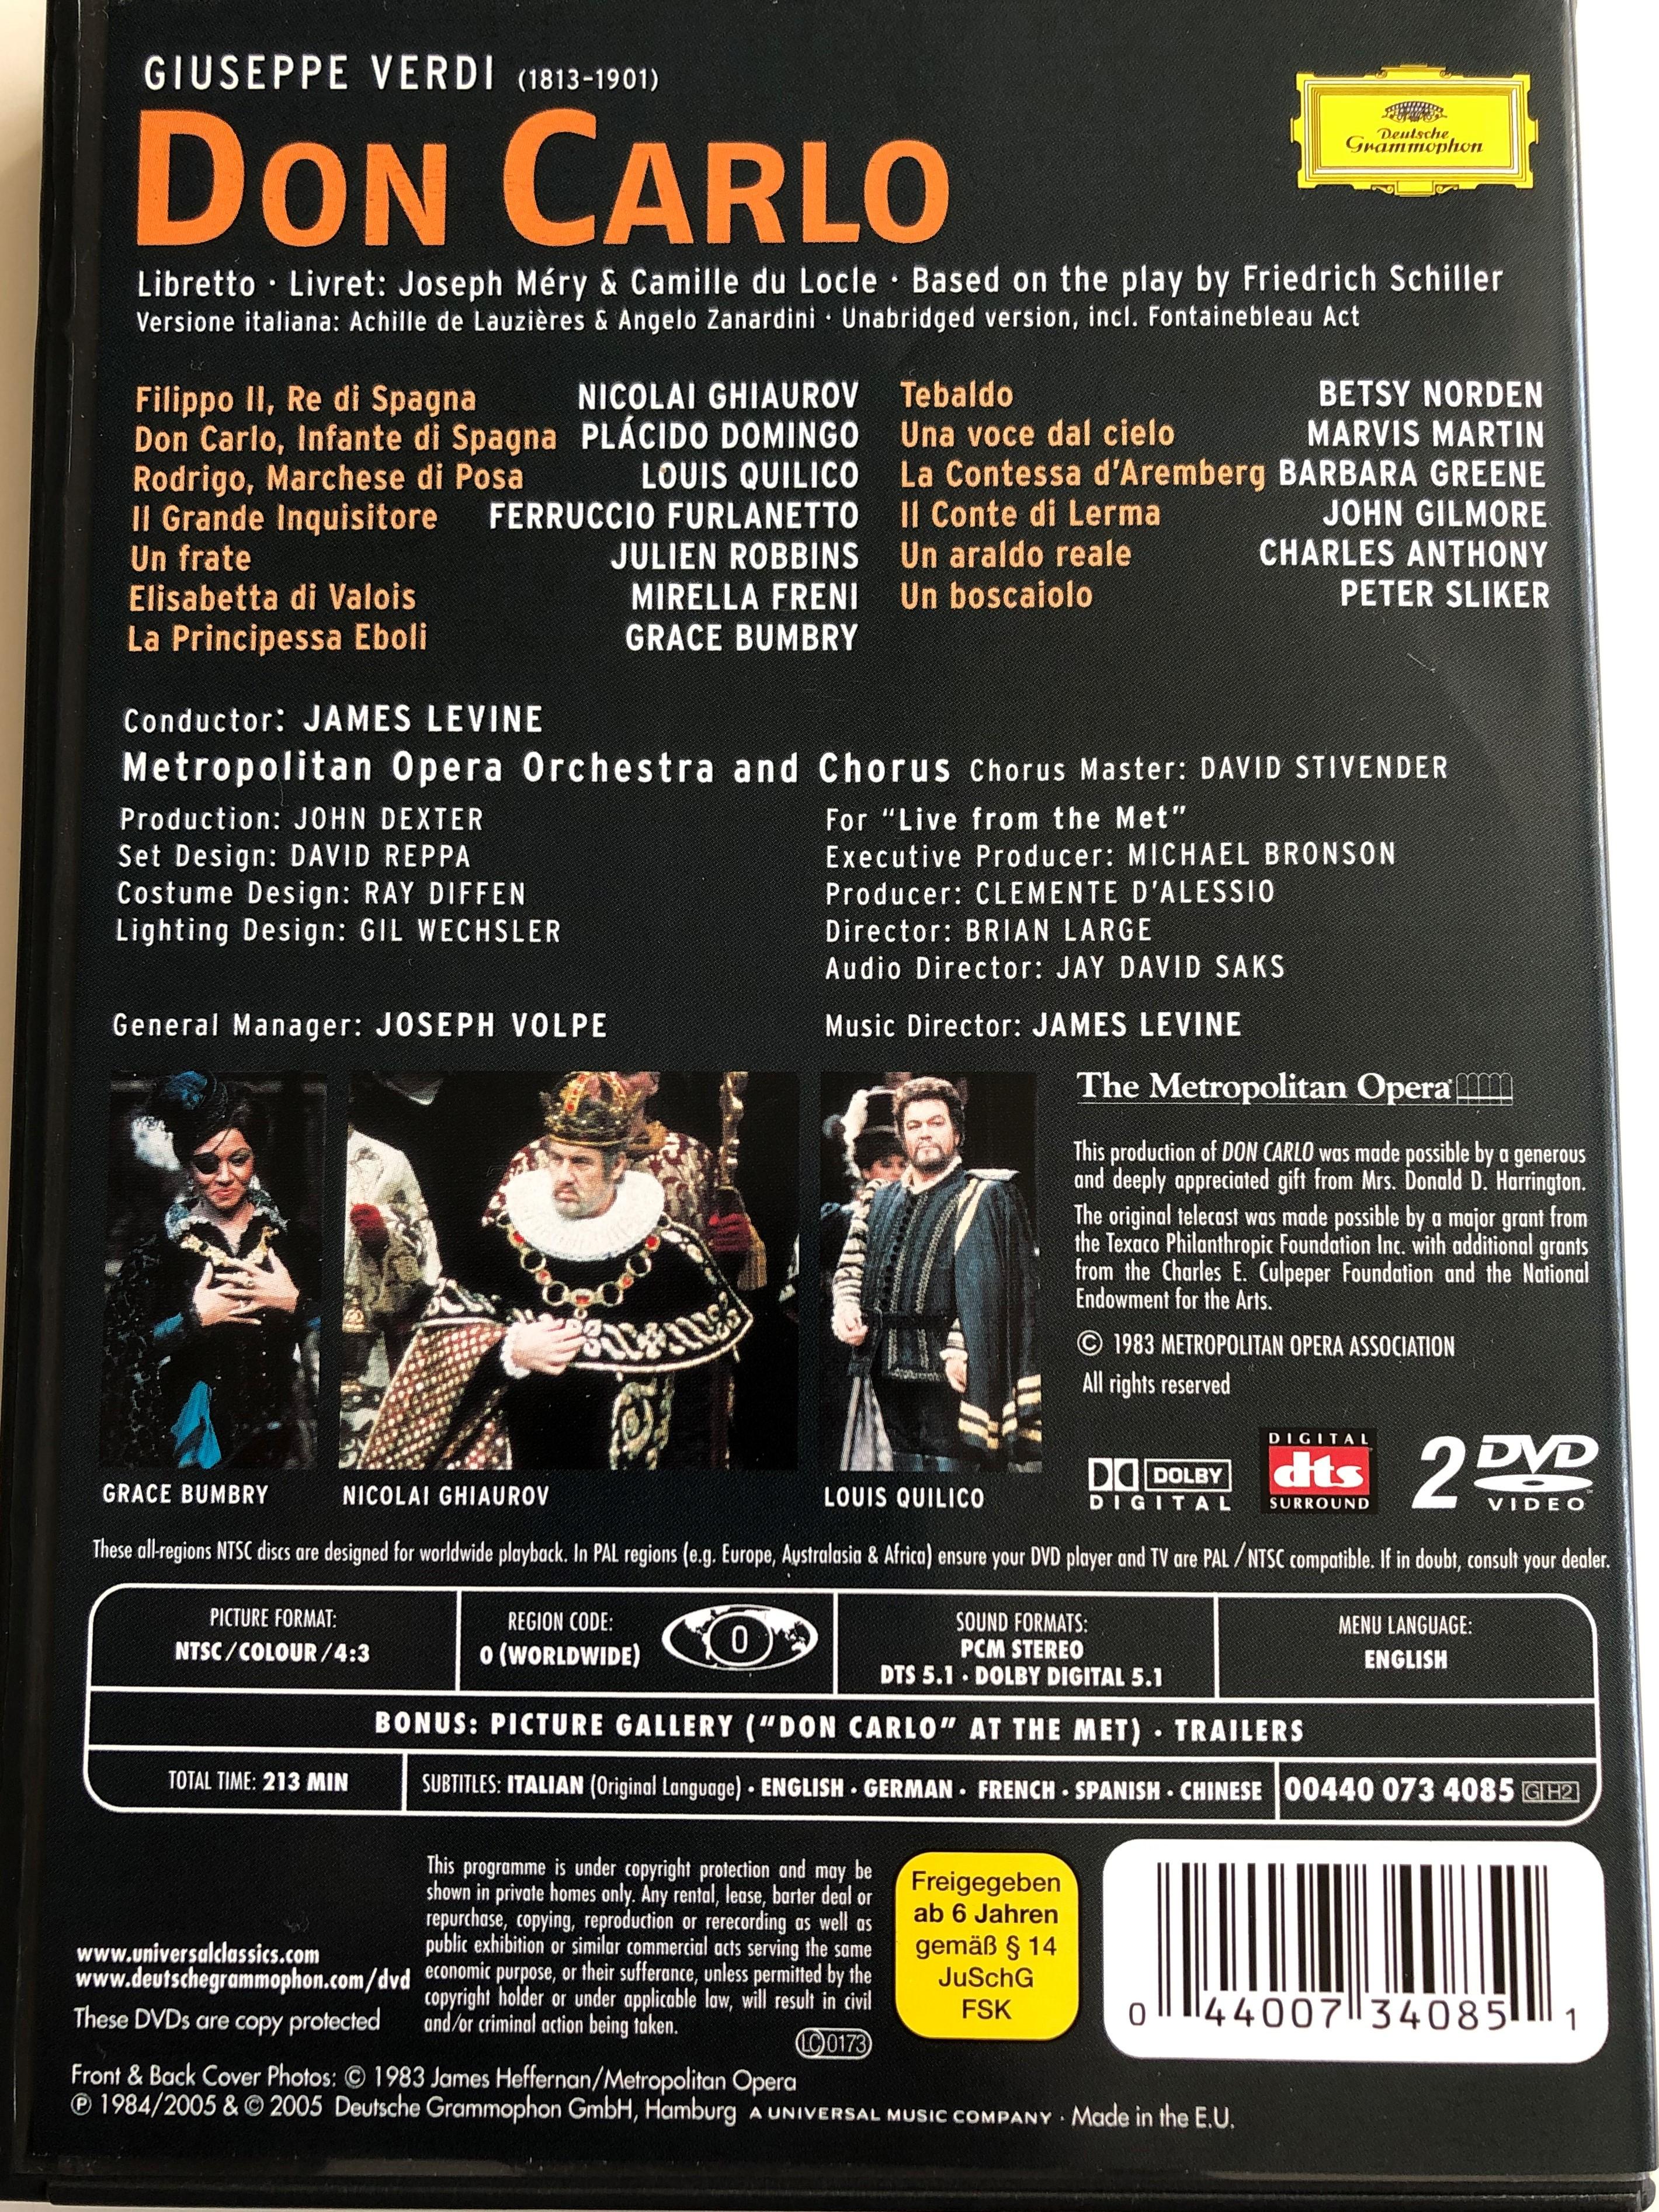 verdi-don-carlo-dvd-2002-pl-cido-domingo-mirella-freni-3.jpg